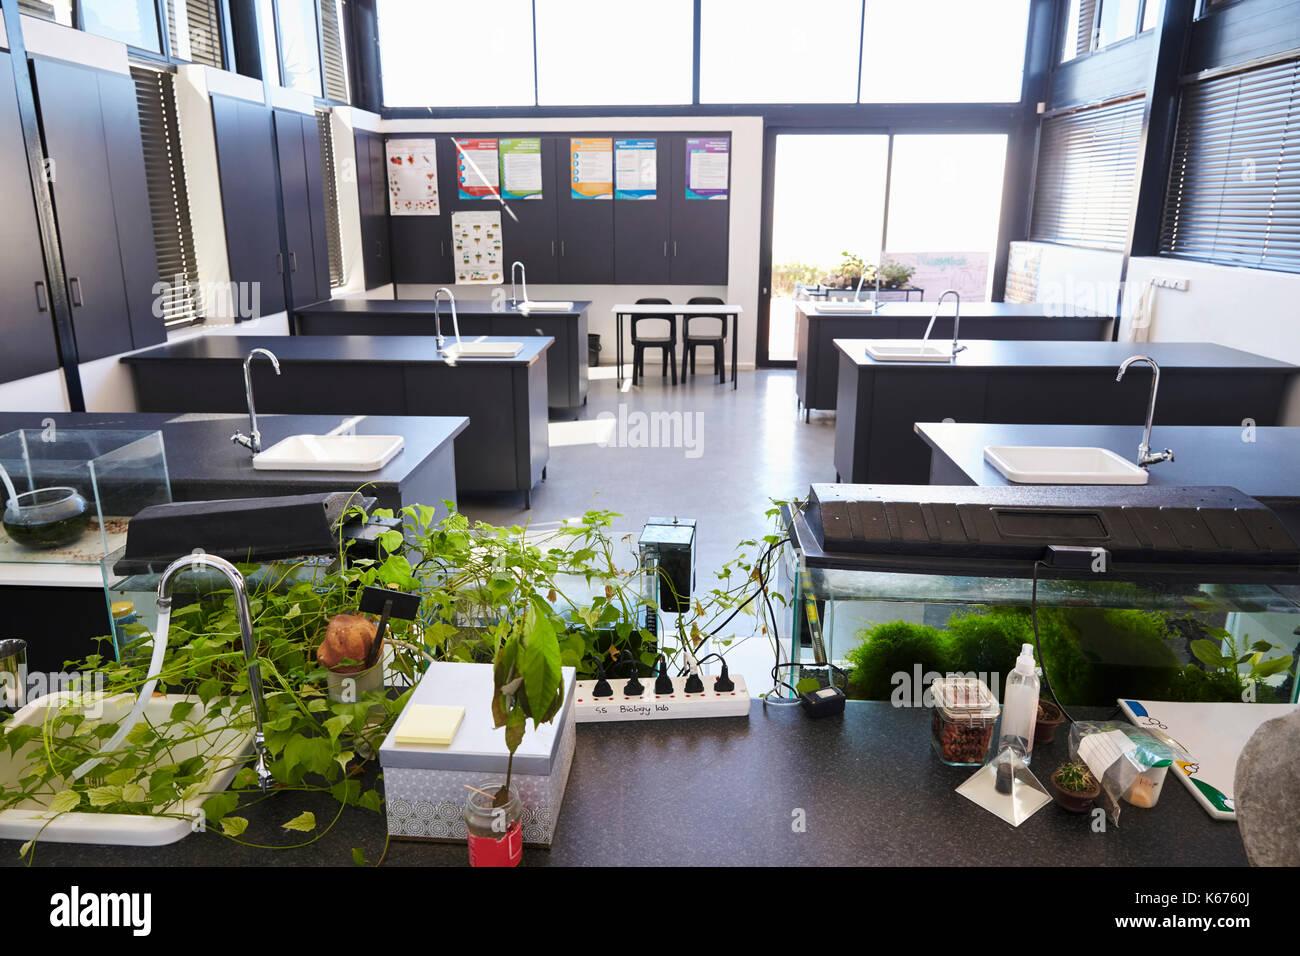 Modern Elementary School Classroom ~ Modern science classroom in an elementary school stock